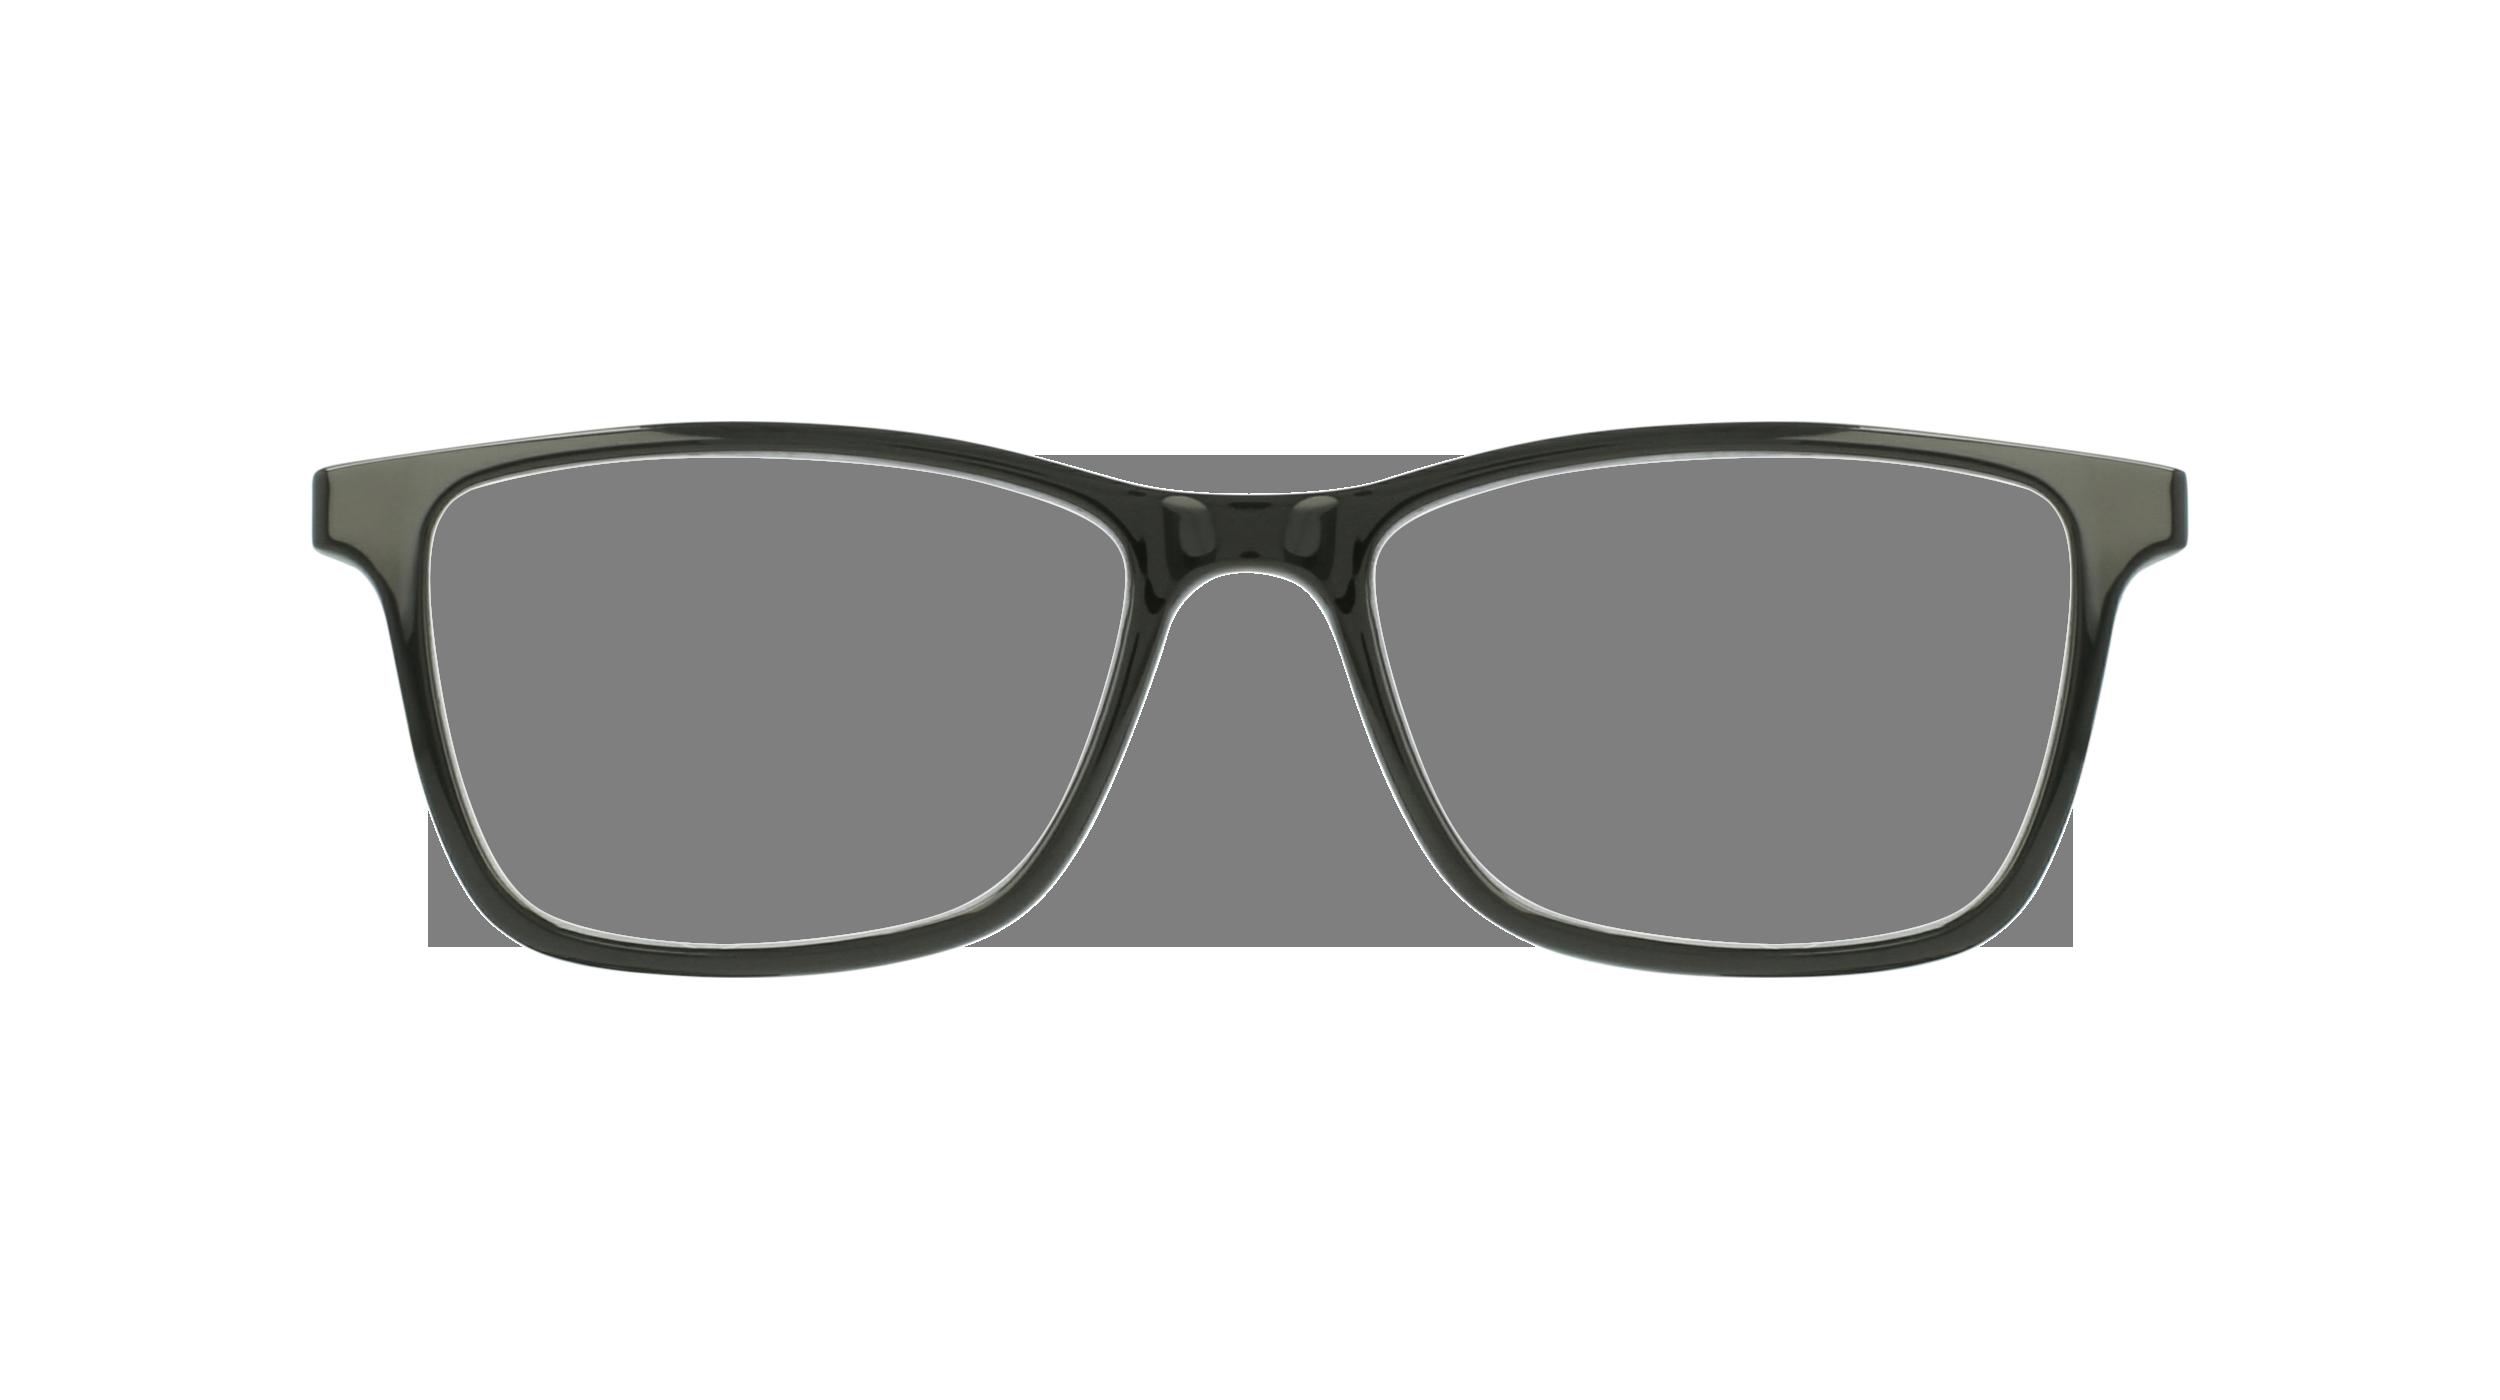 afflelou/france/products/smart_clip/clips_glasses/07630036457825.png